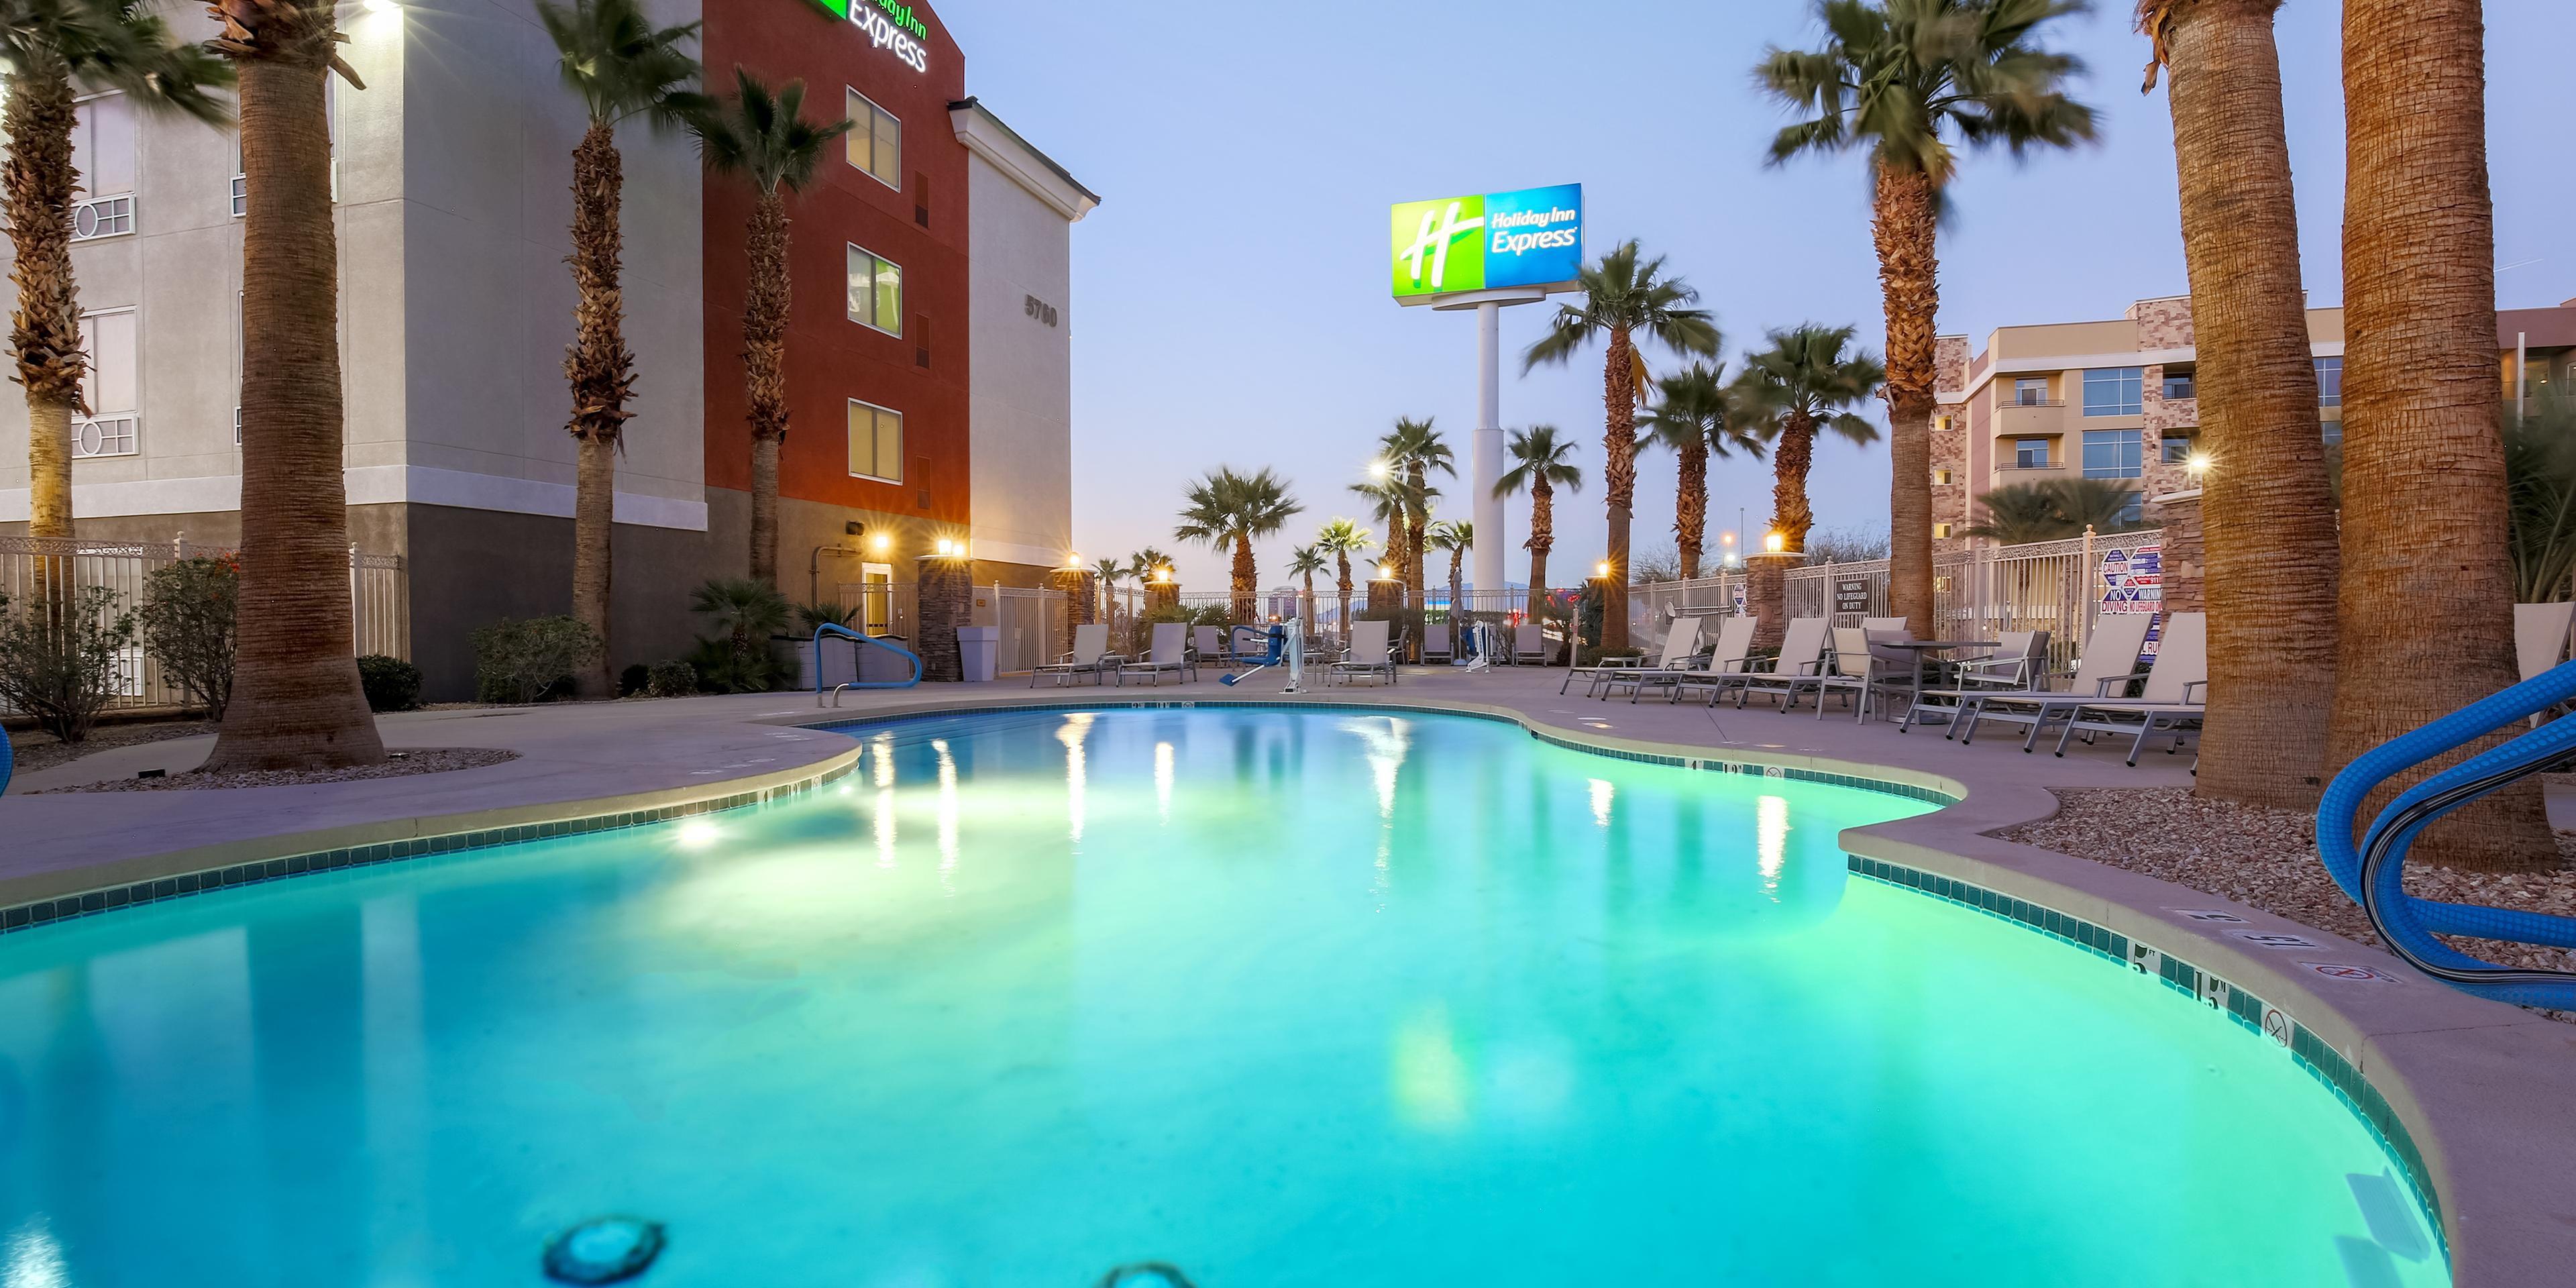 Holiday Inn Express Las Vegas - South Hotel by IHG